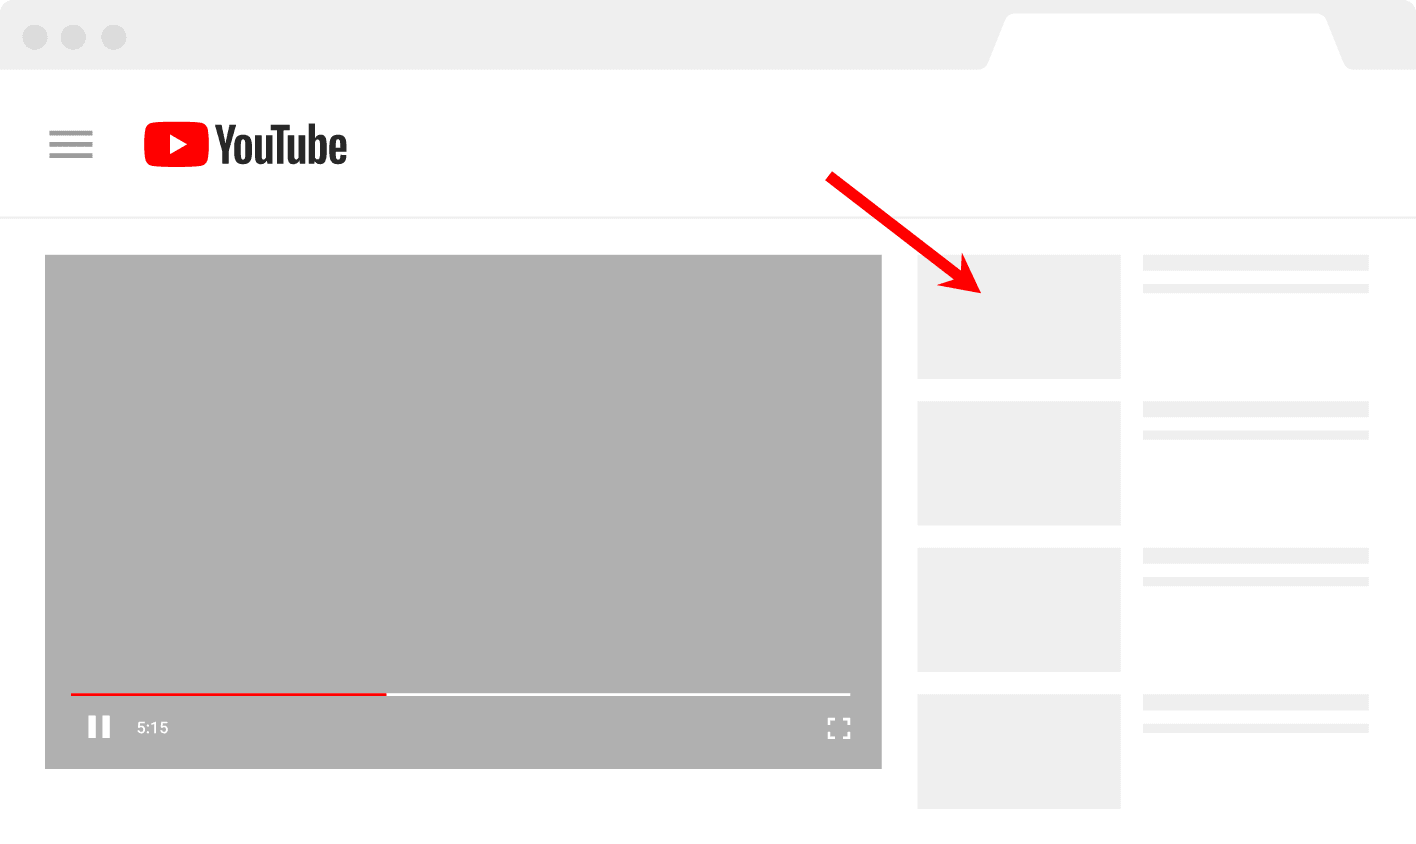 YouTube watch time sidebar